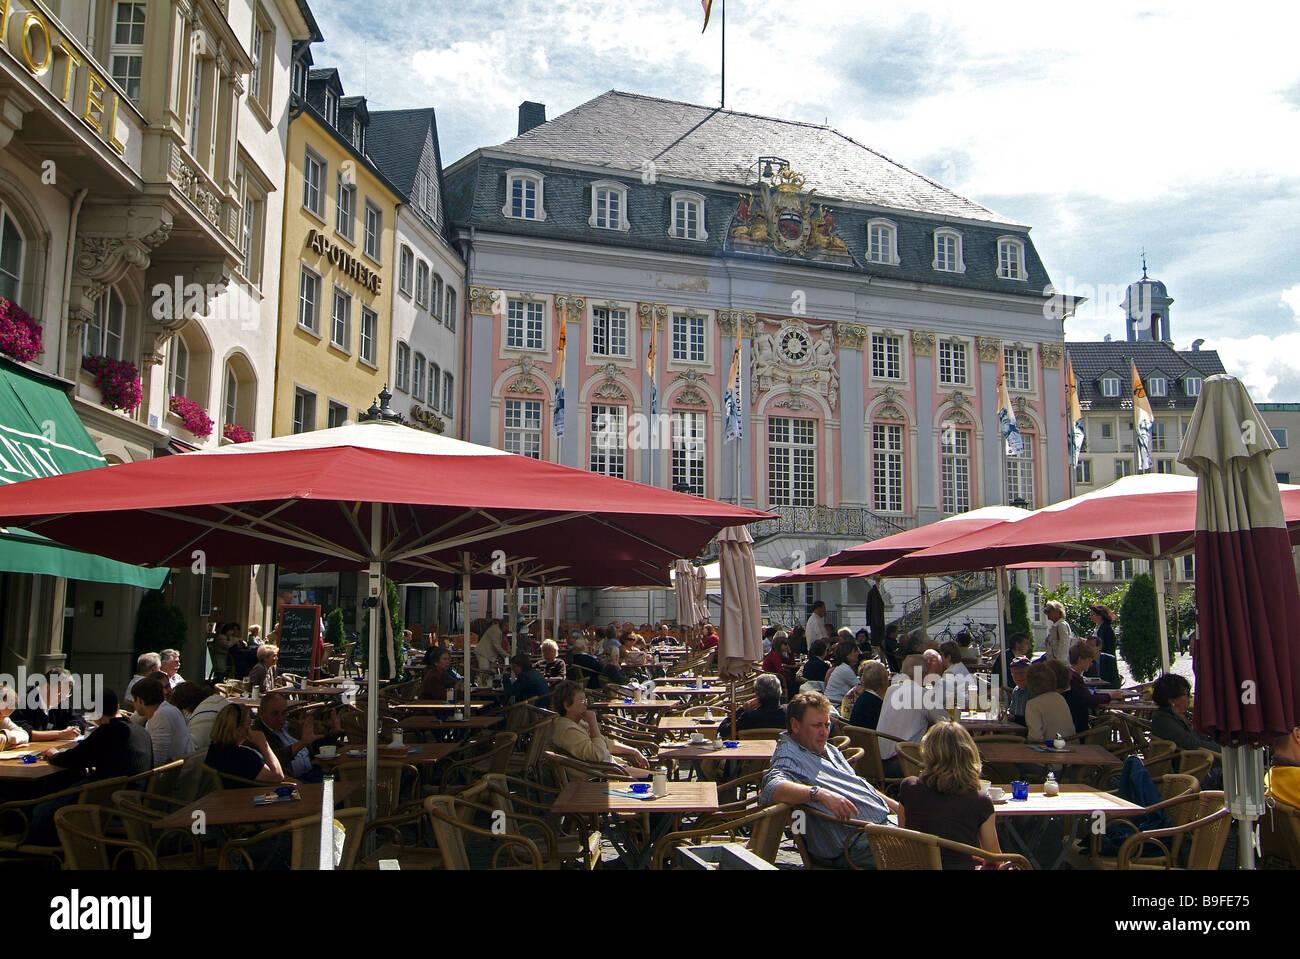 Germany Bonn town hall market place pub outside - Stock Image